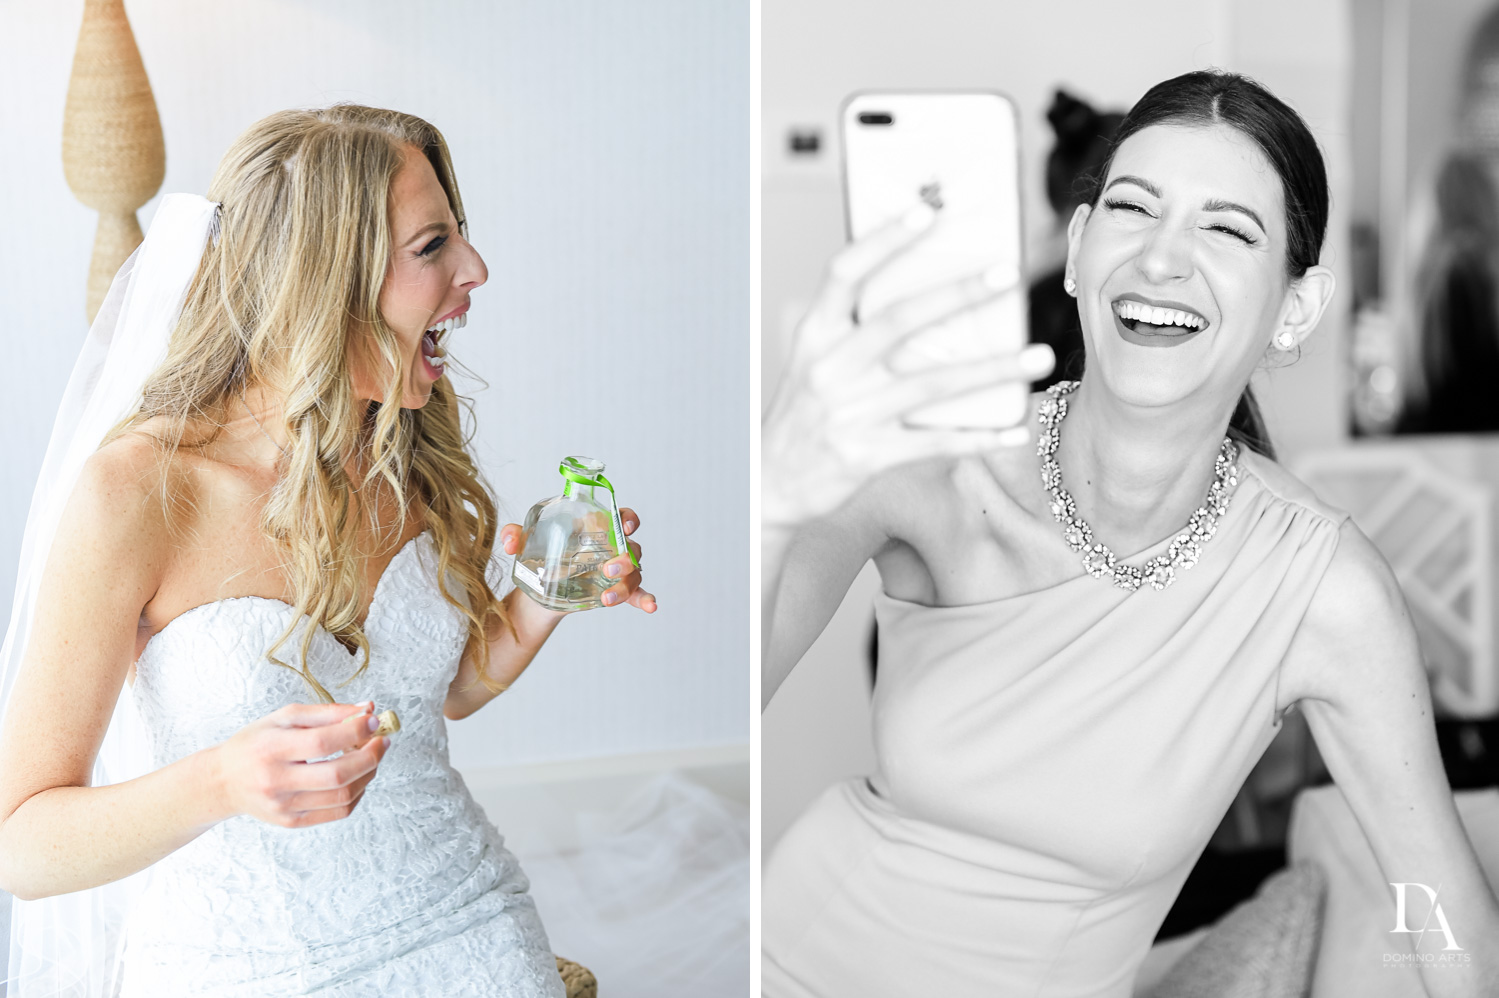 fun bride at Tropical Luxury Jewish Wedding in Miami Beach by Domino Arts Photography